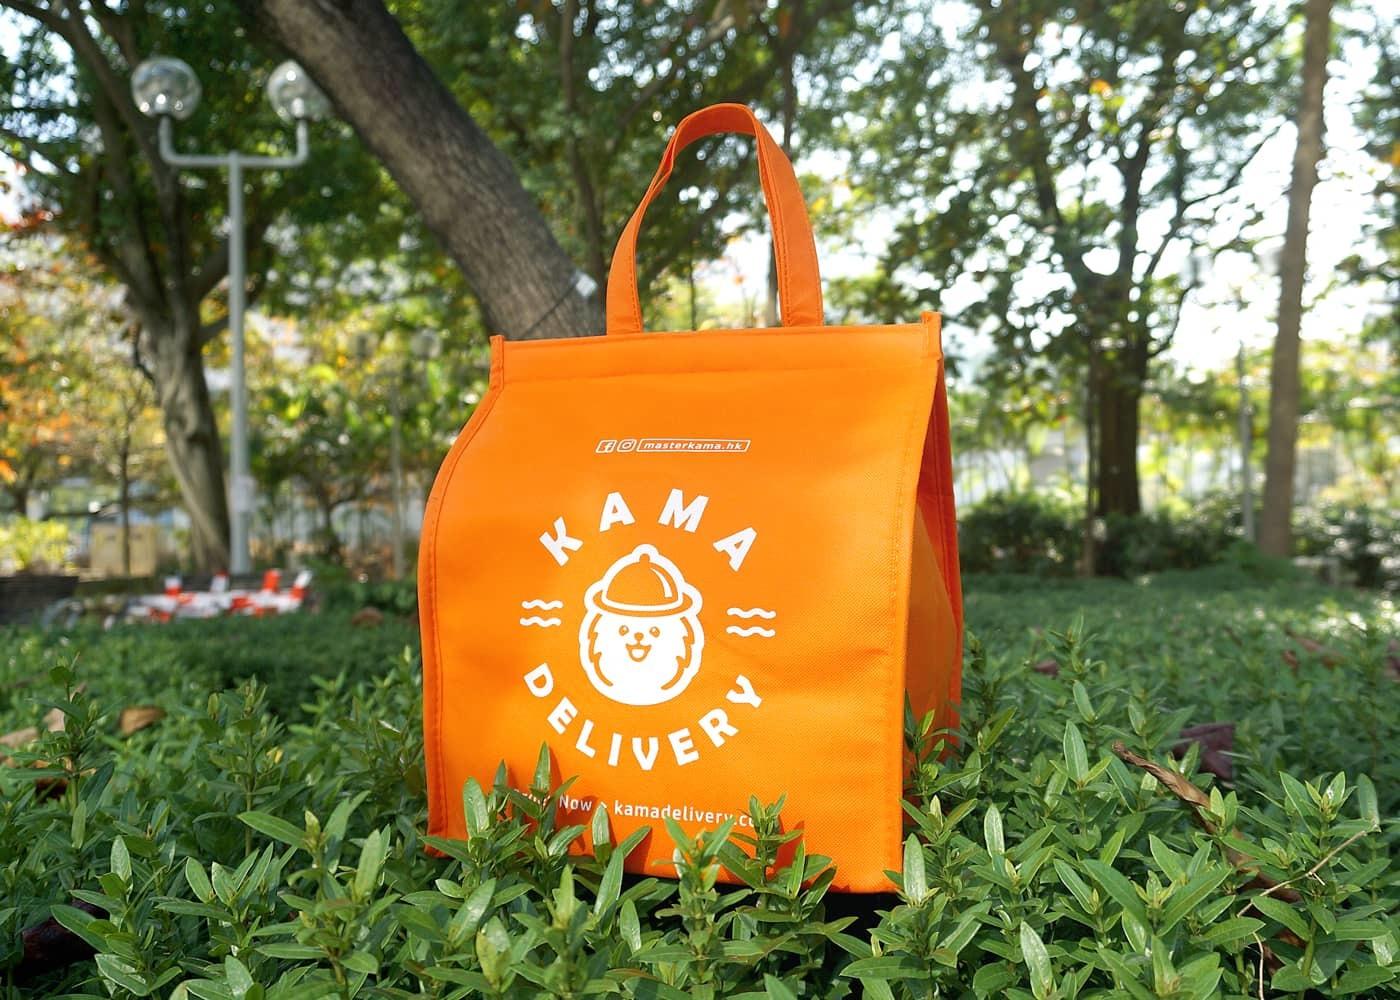 2021到會優惠|網上訂購優惠每月更新|Kama Delivery Catering